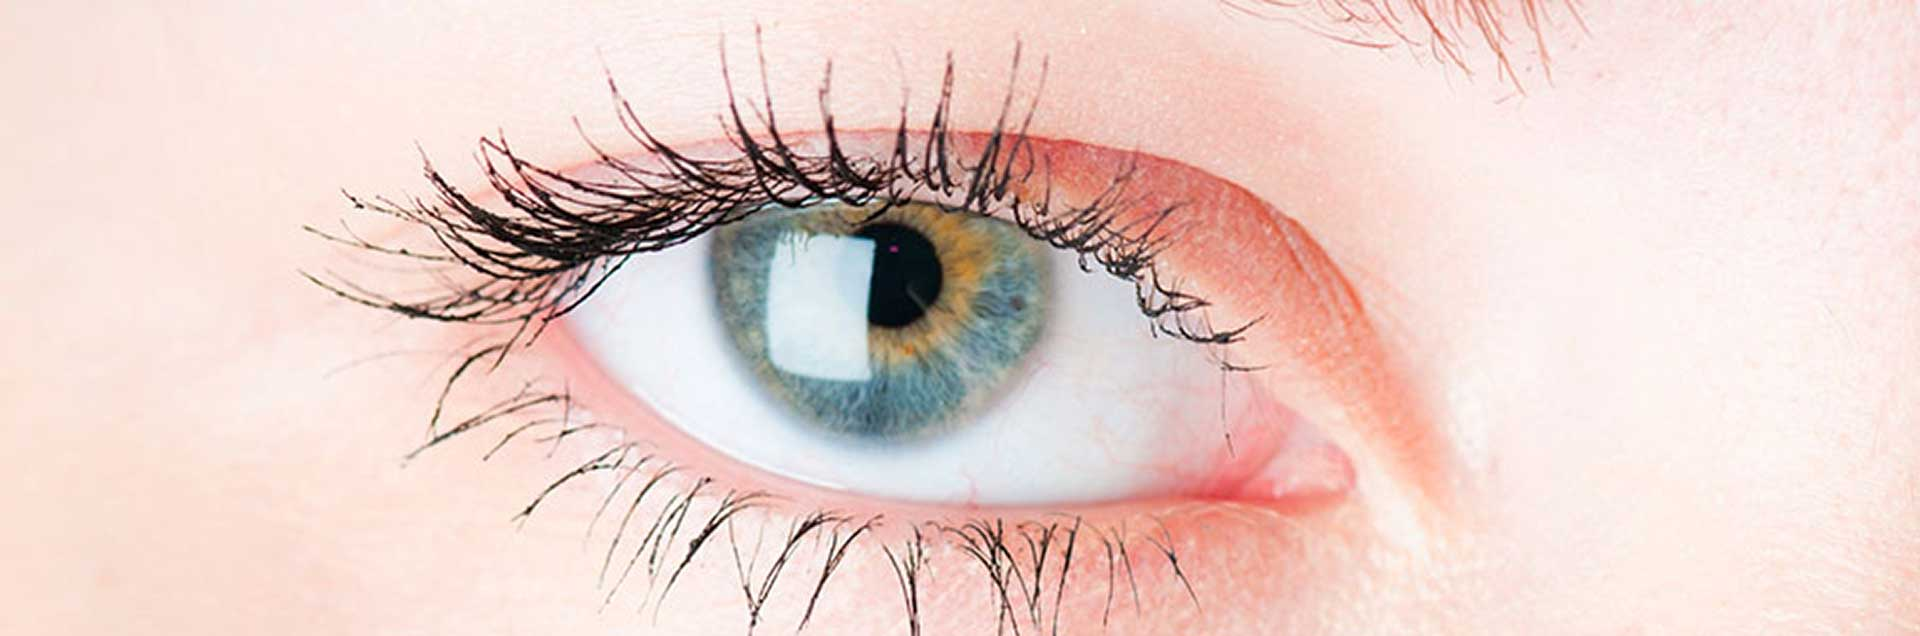 eye-care-101